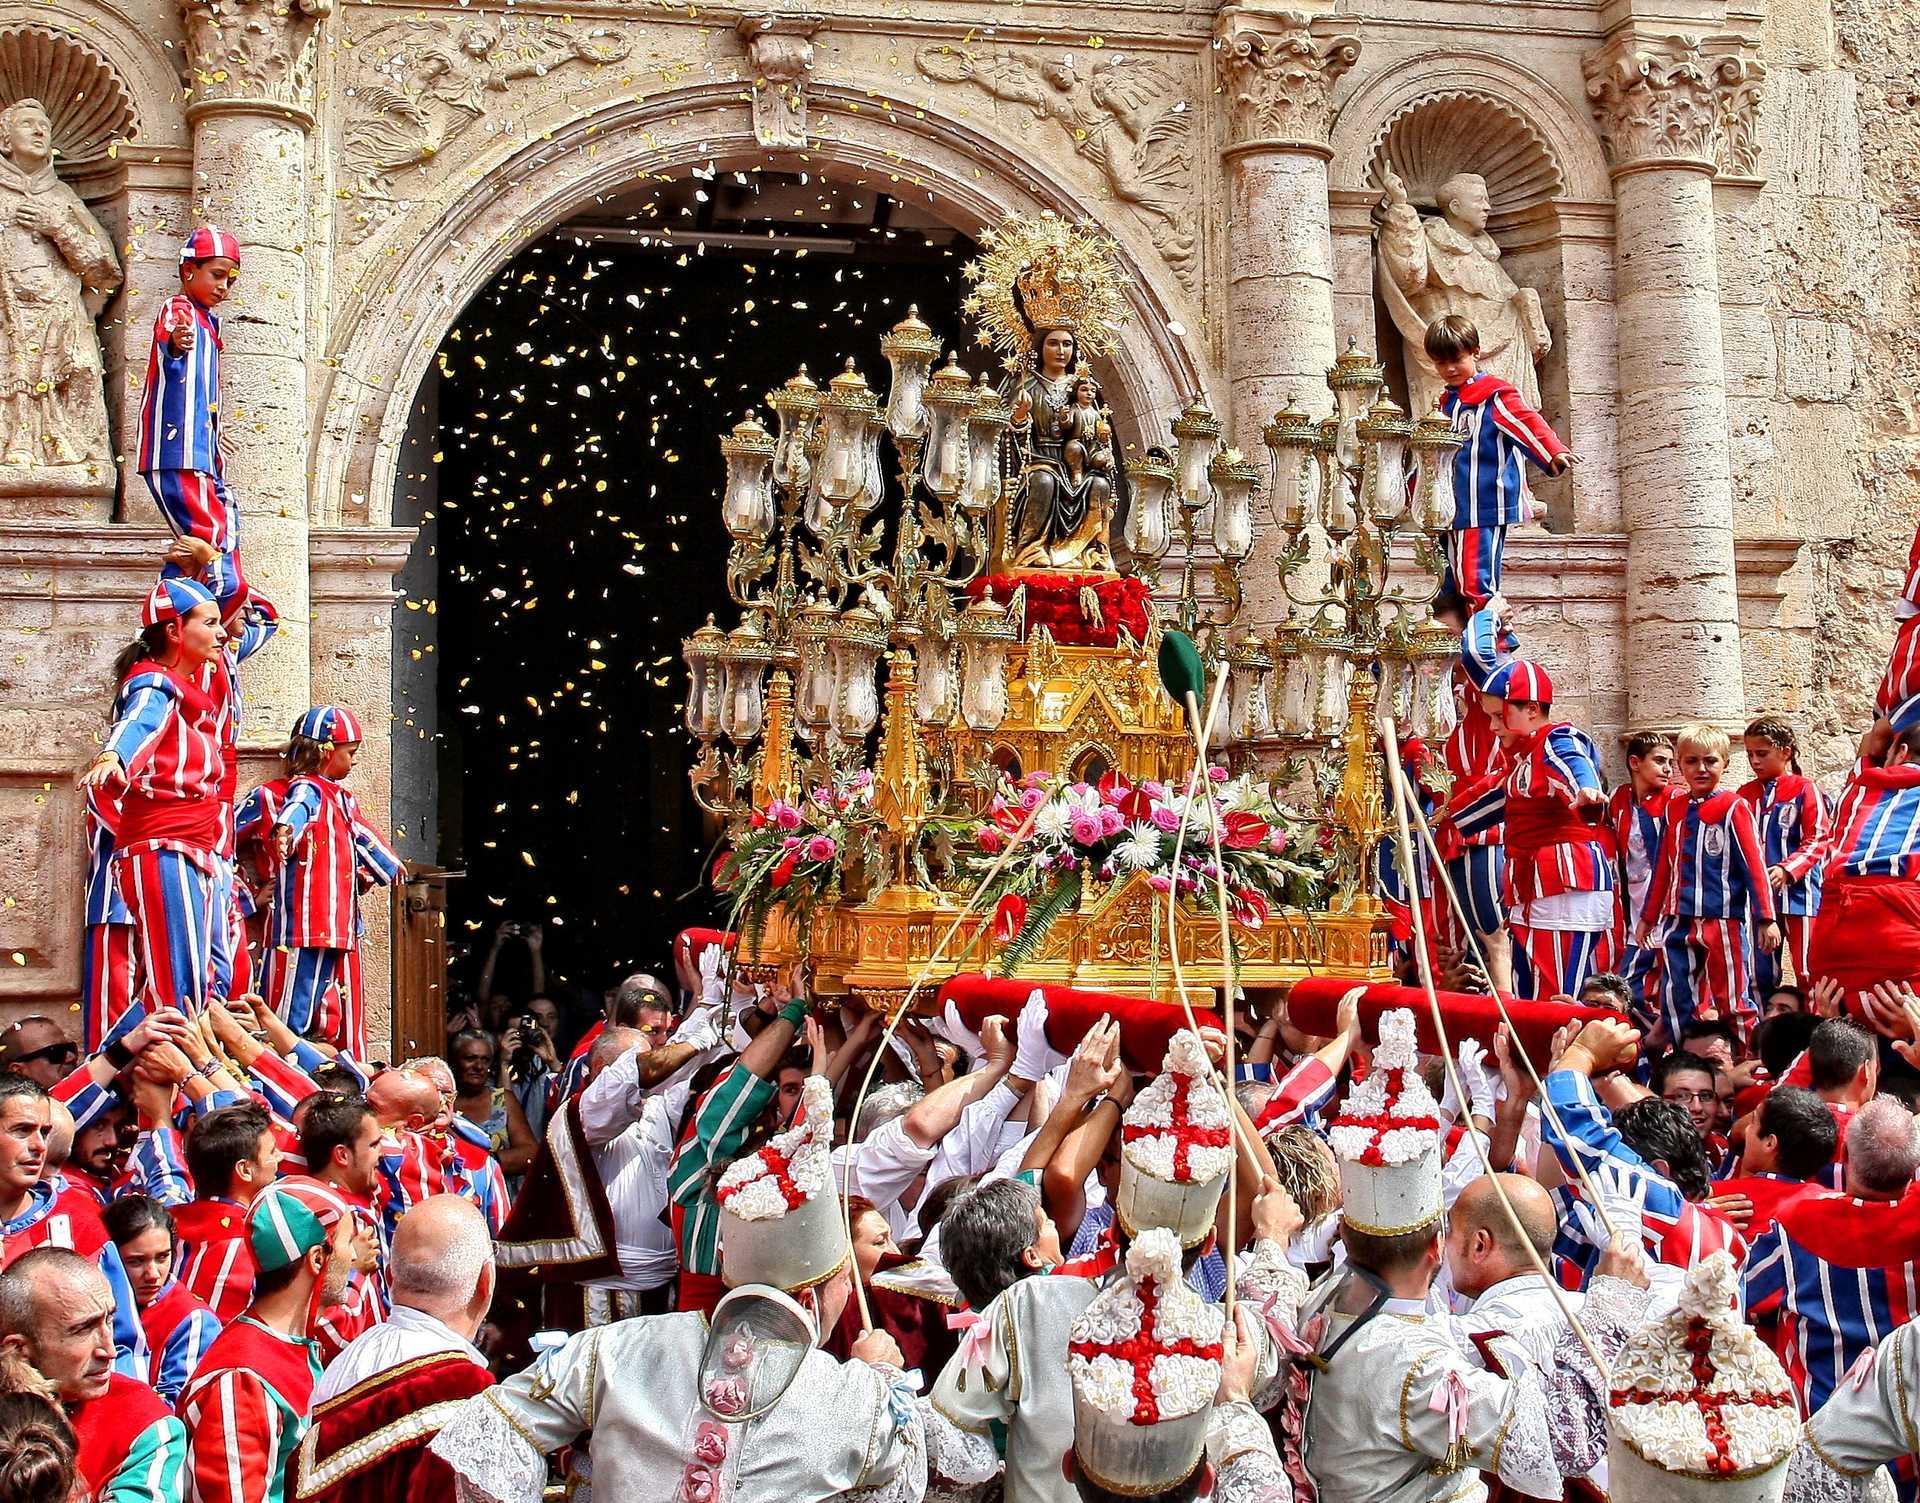 Fiestas de la Mare de Déu de la Salut